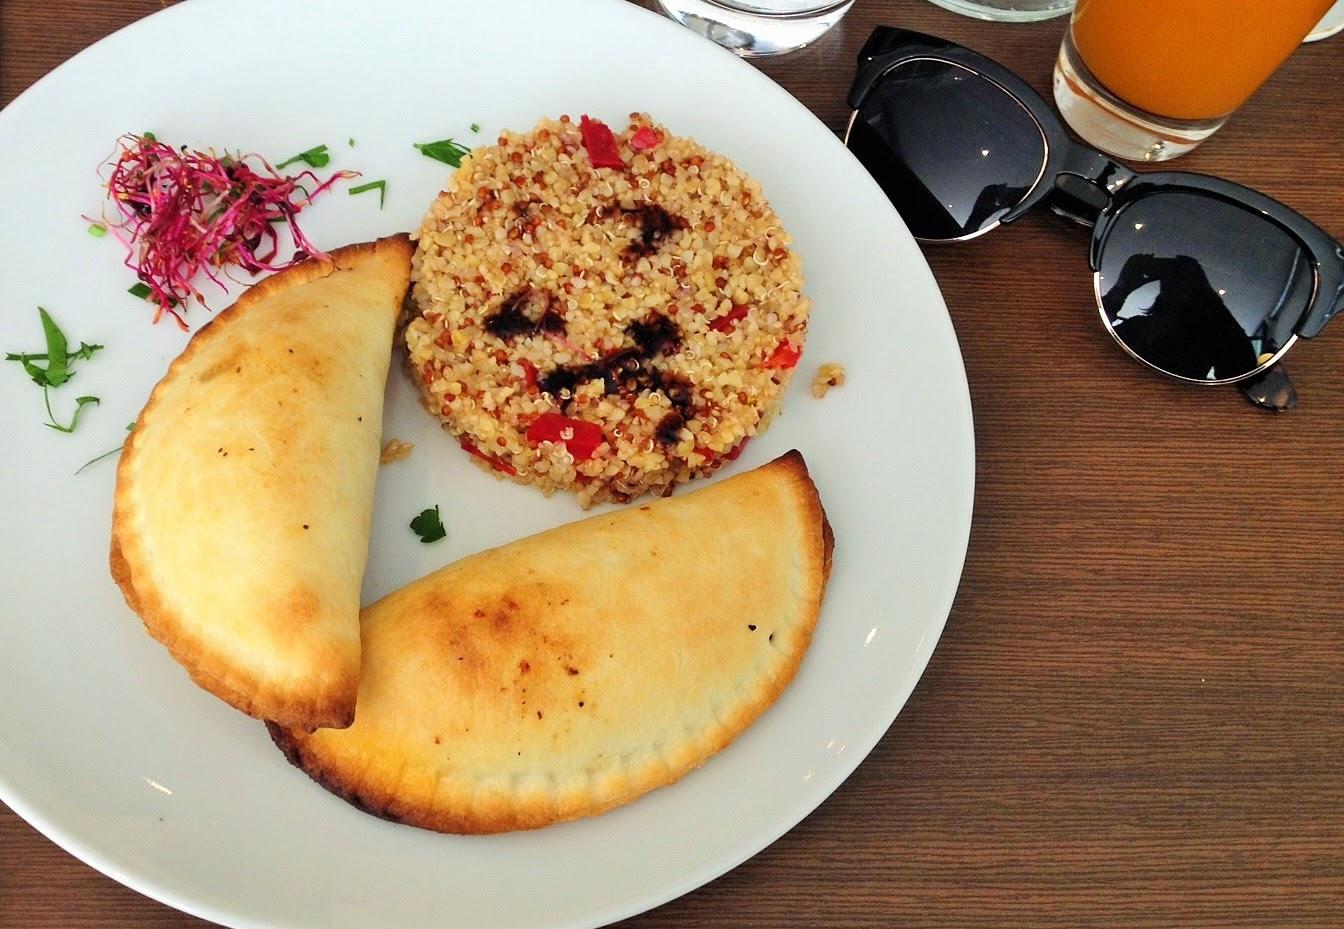 Le Strobi - restaurant - Paris place de clichy - empanadas de carne